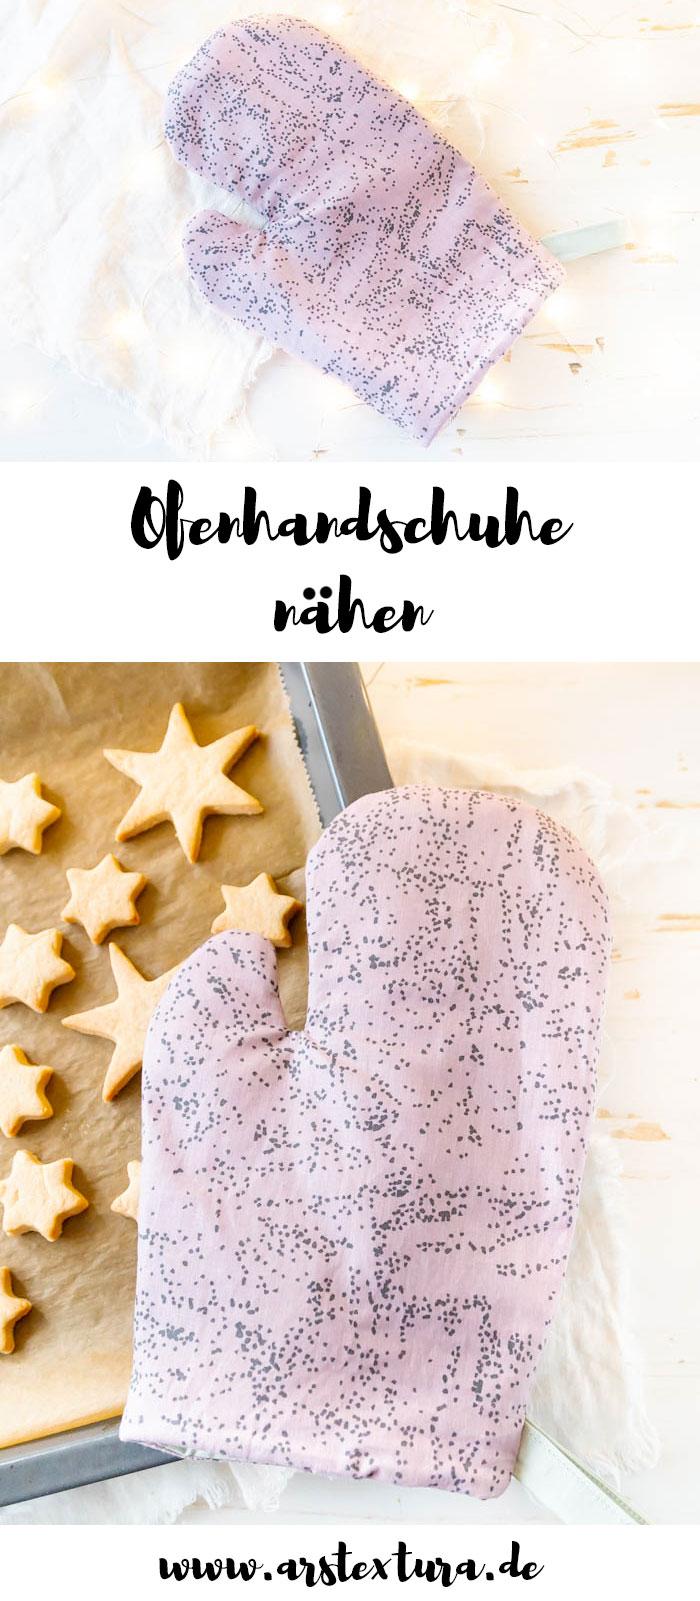 Ofenhandschuh nähen mit Anleitung